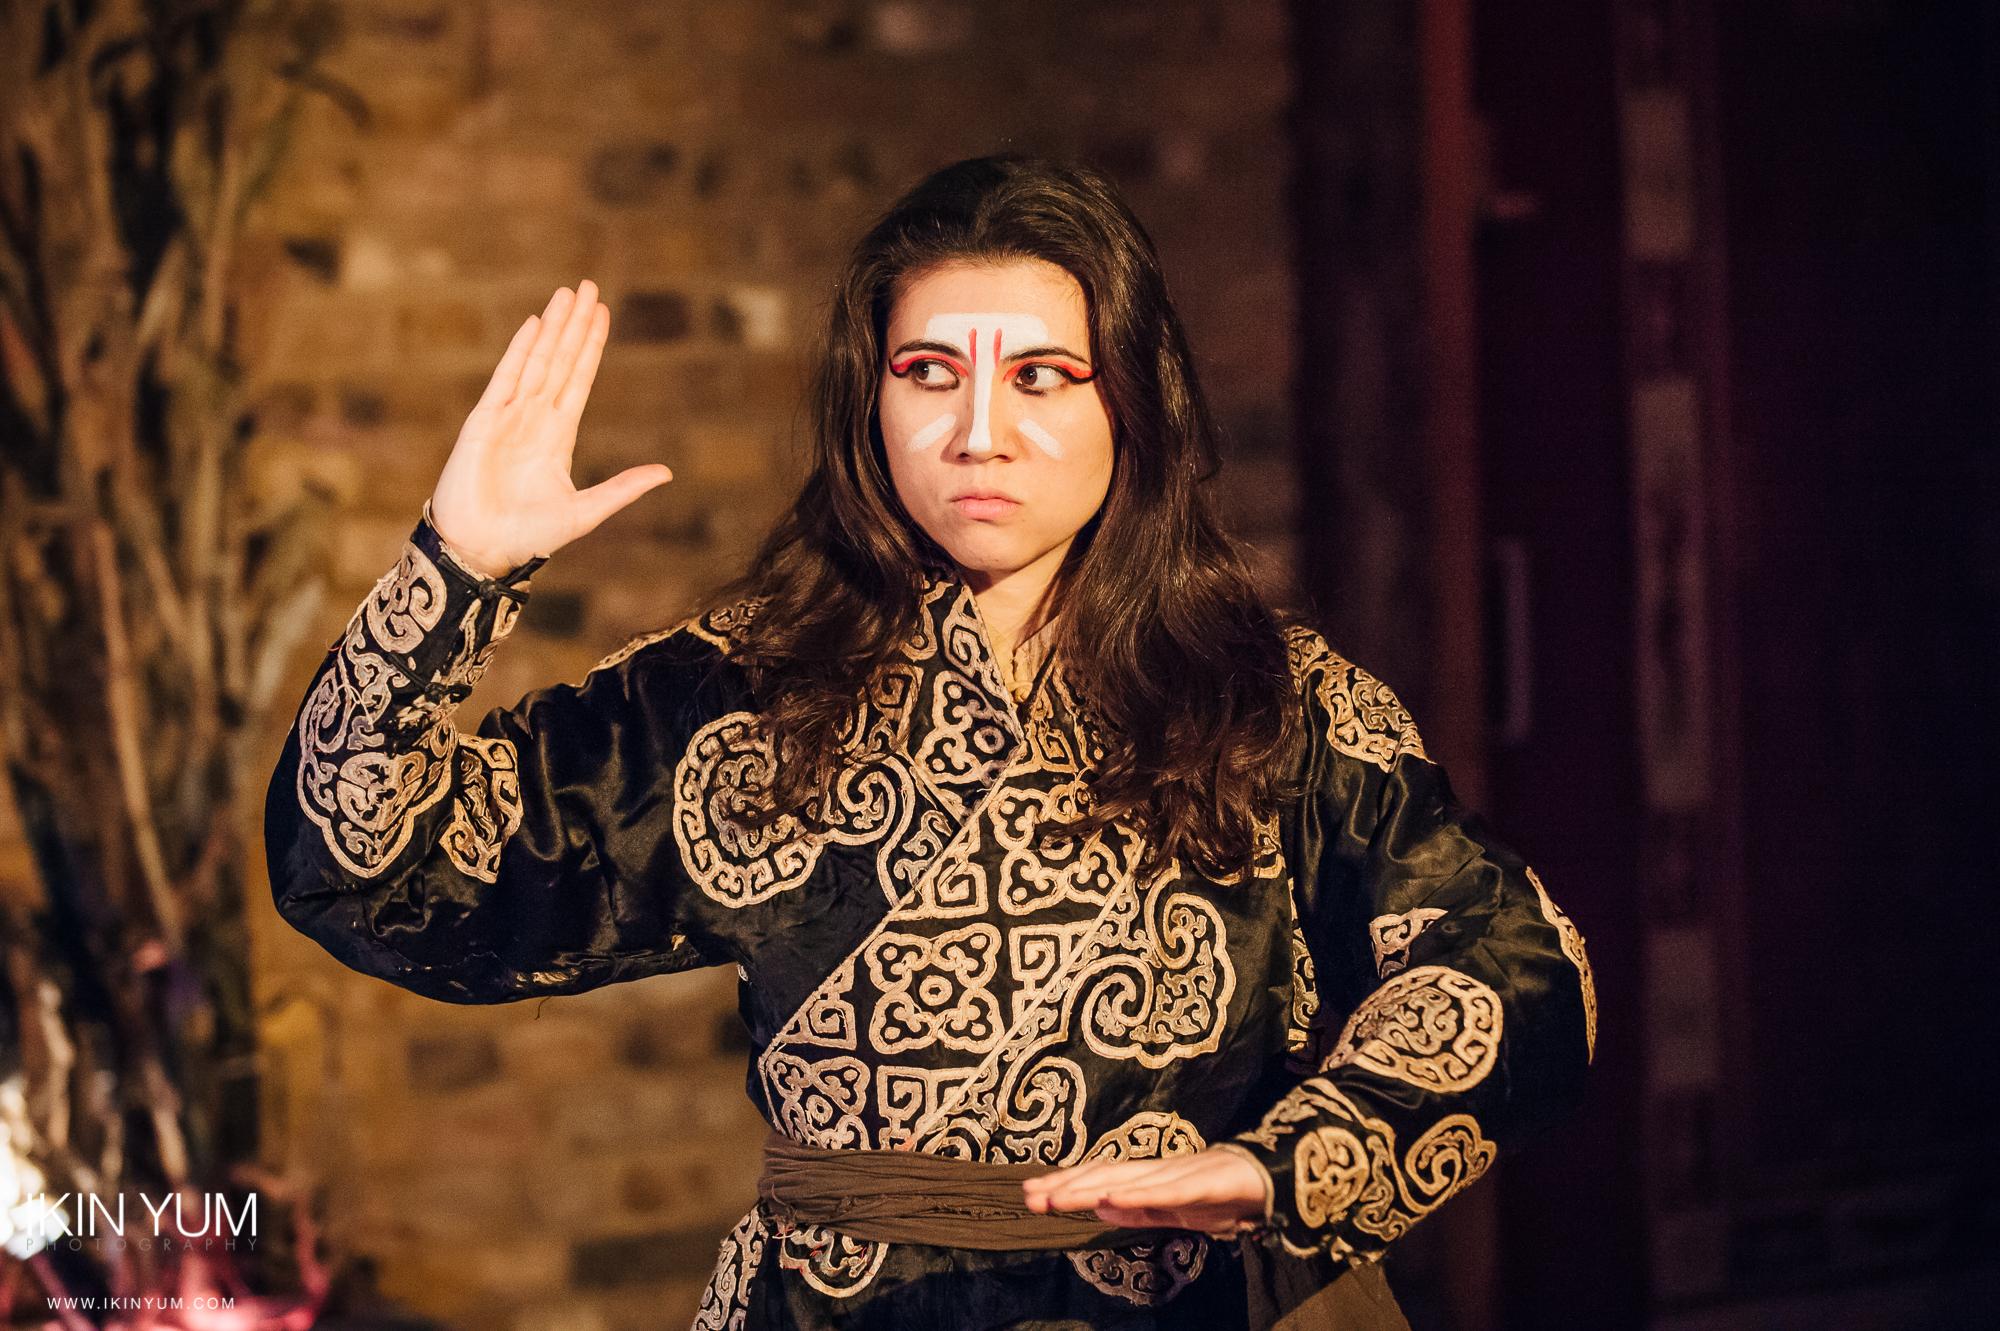 Forgotten - Arcola Theatre - Ikin Yum Photography-033.jpg